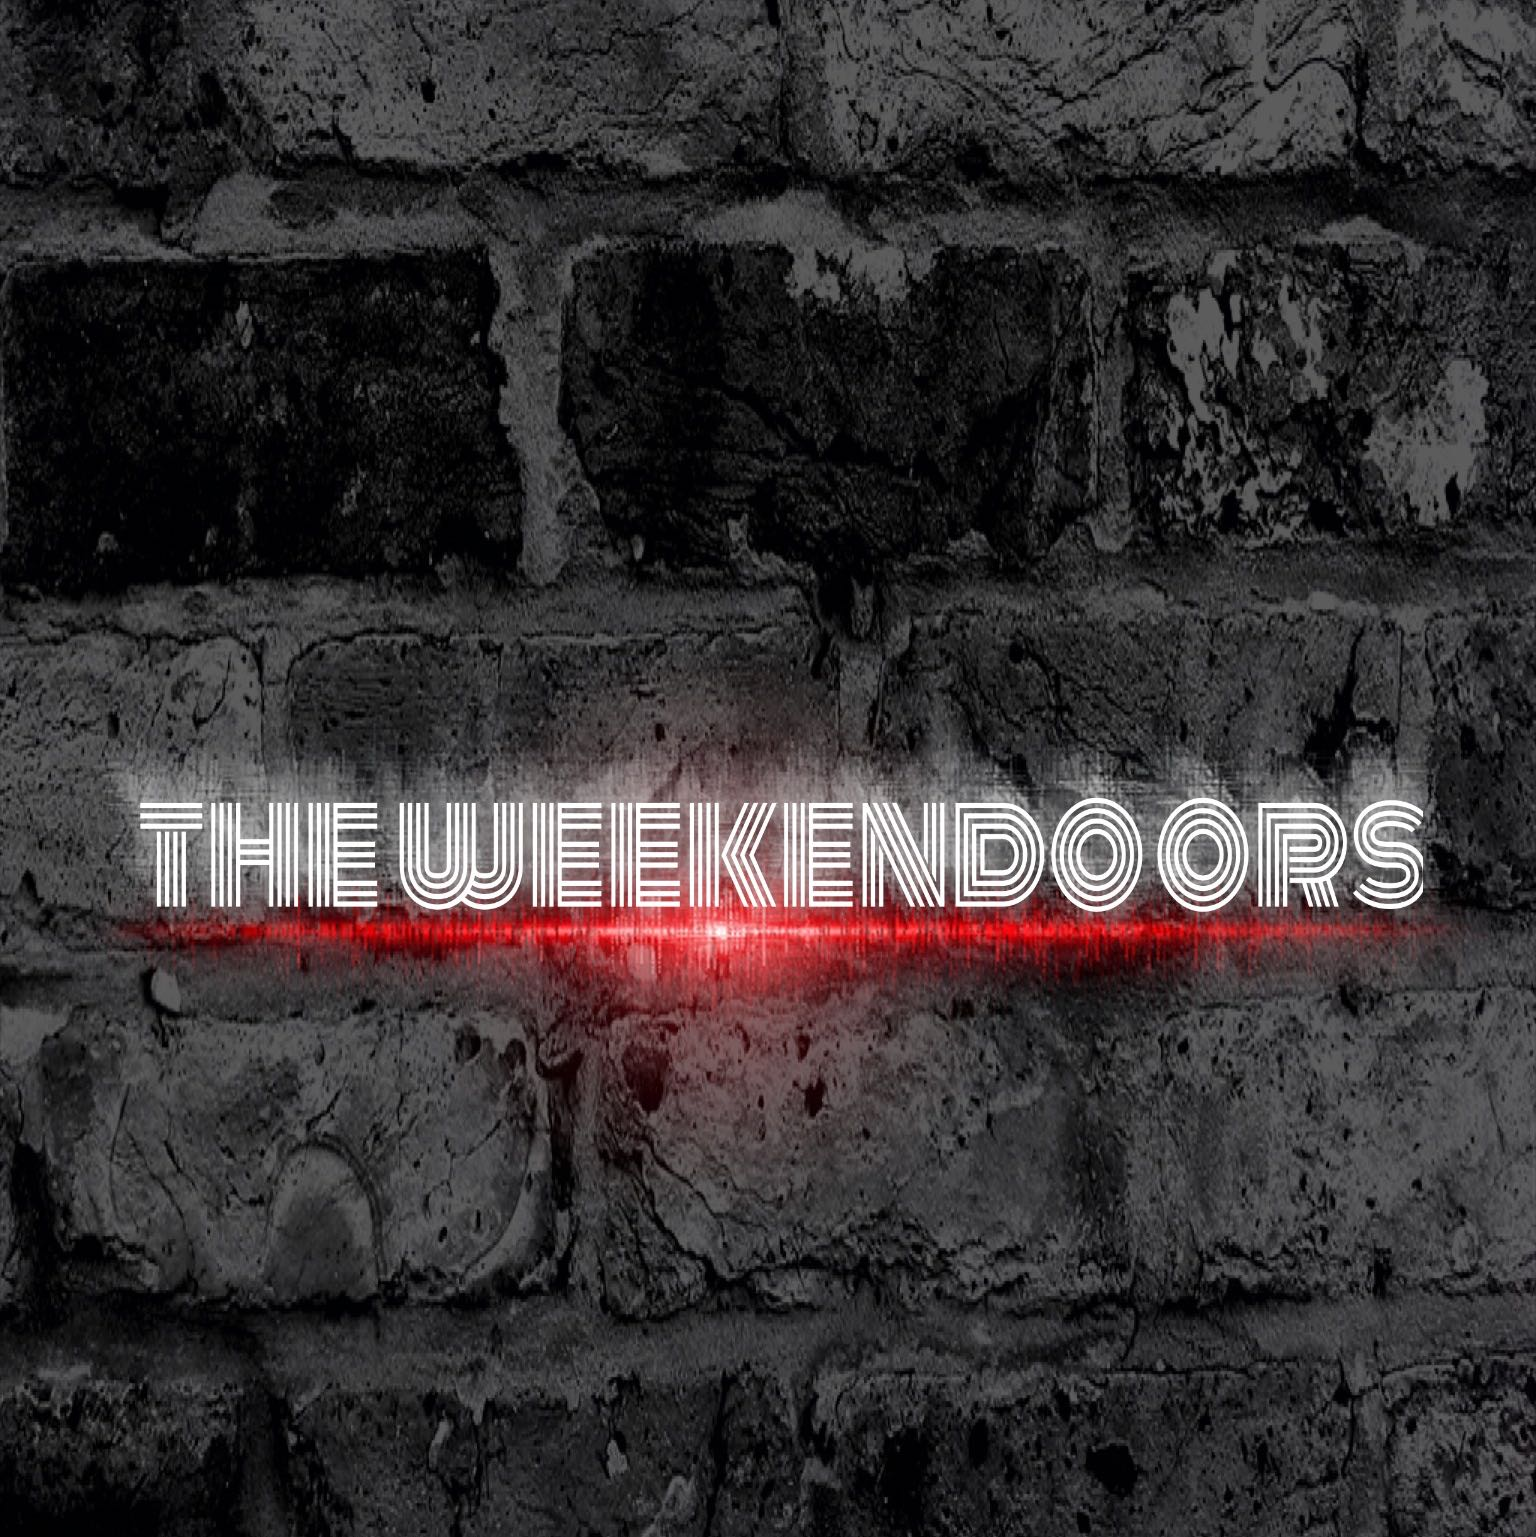 theweekendoors